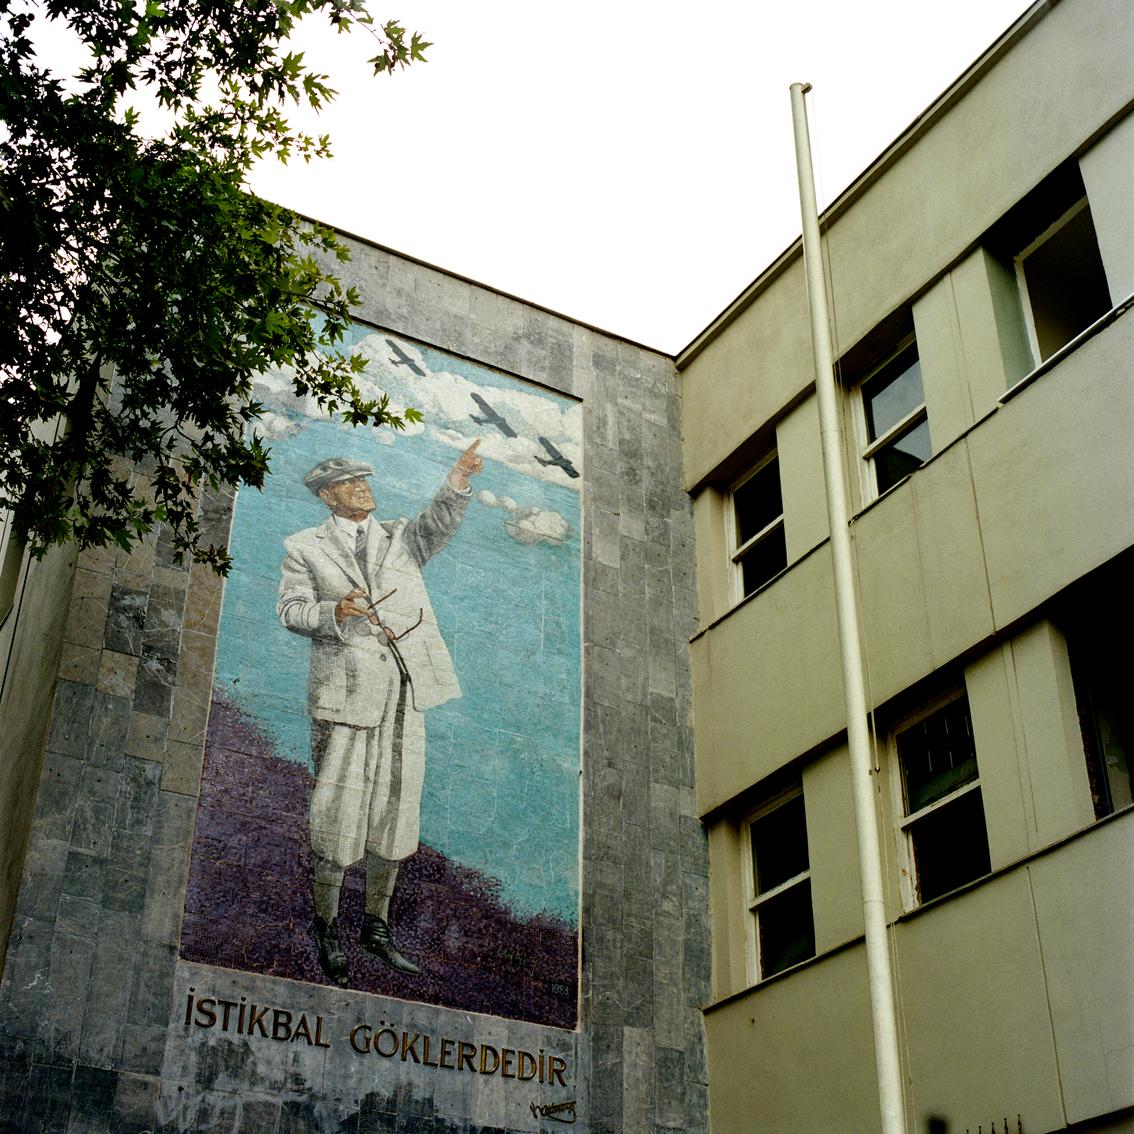 Mural on a wall in Ankara, Turkey